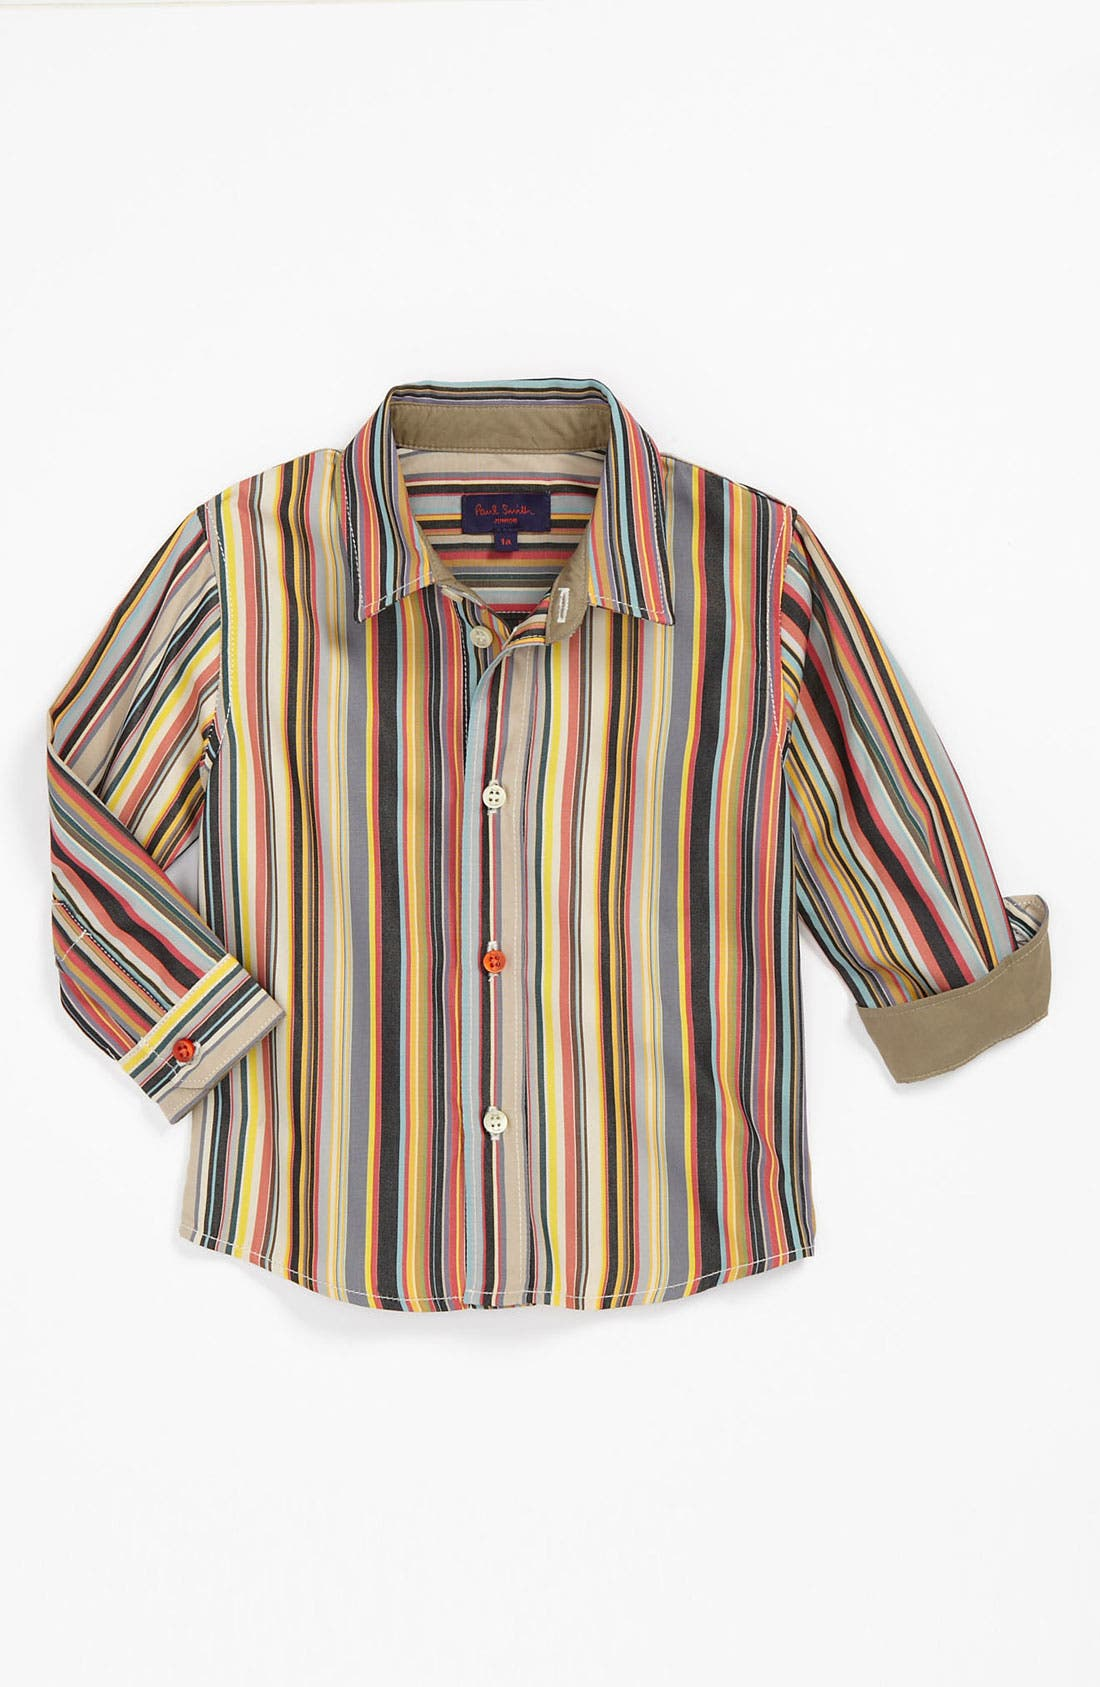 Main Image - Paul Smith Junior Stripe Dress Shirt (Baby)